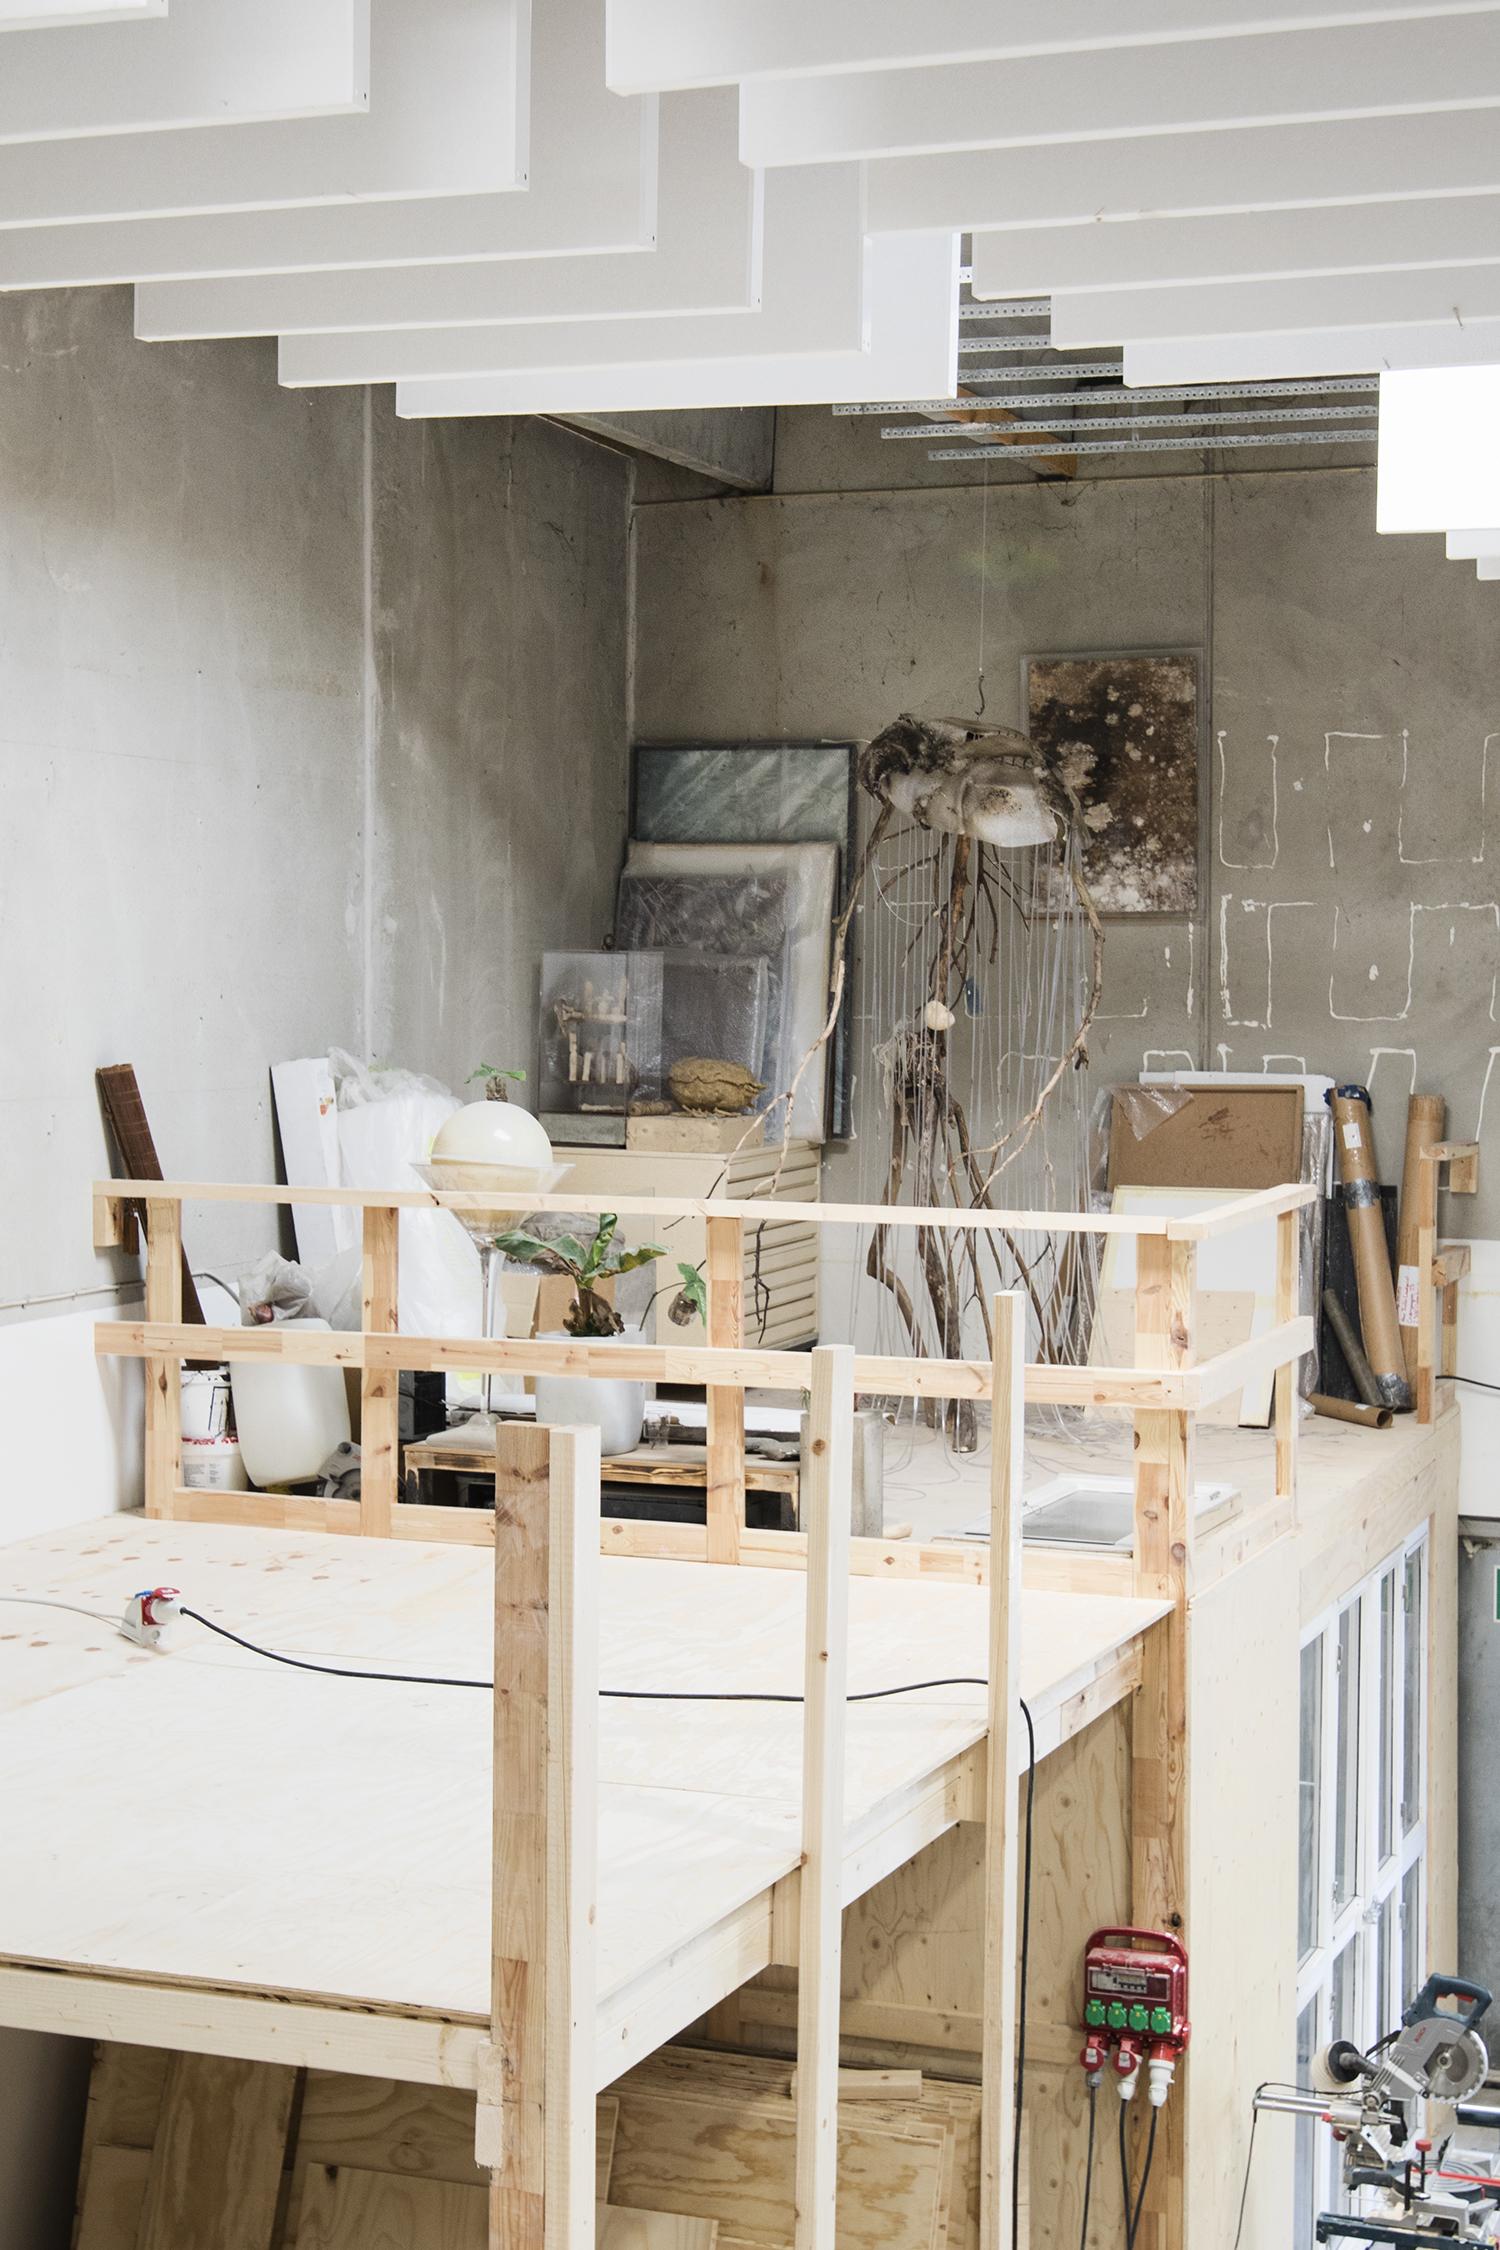 Silas Inoues atelier. Foto © I DO ART Agency.